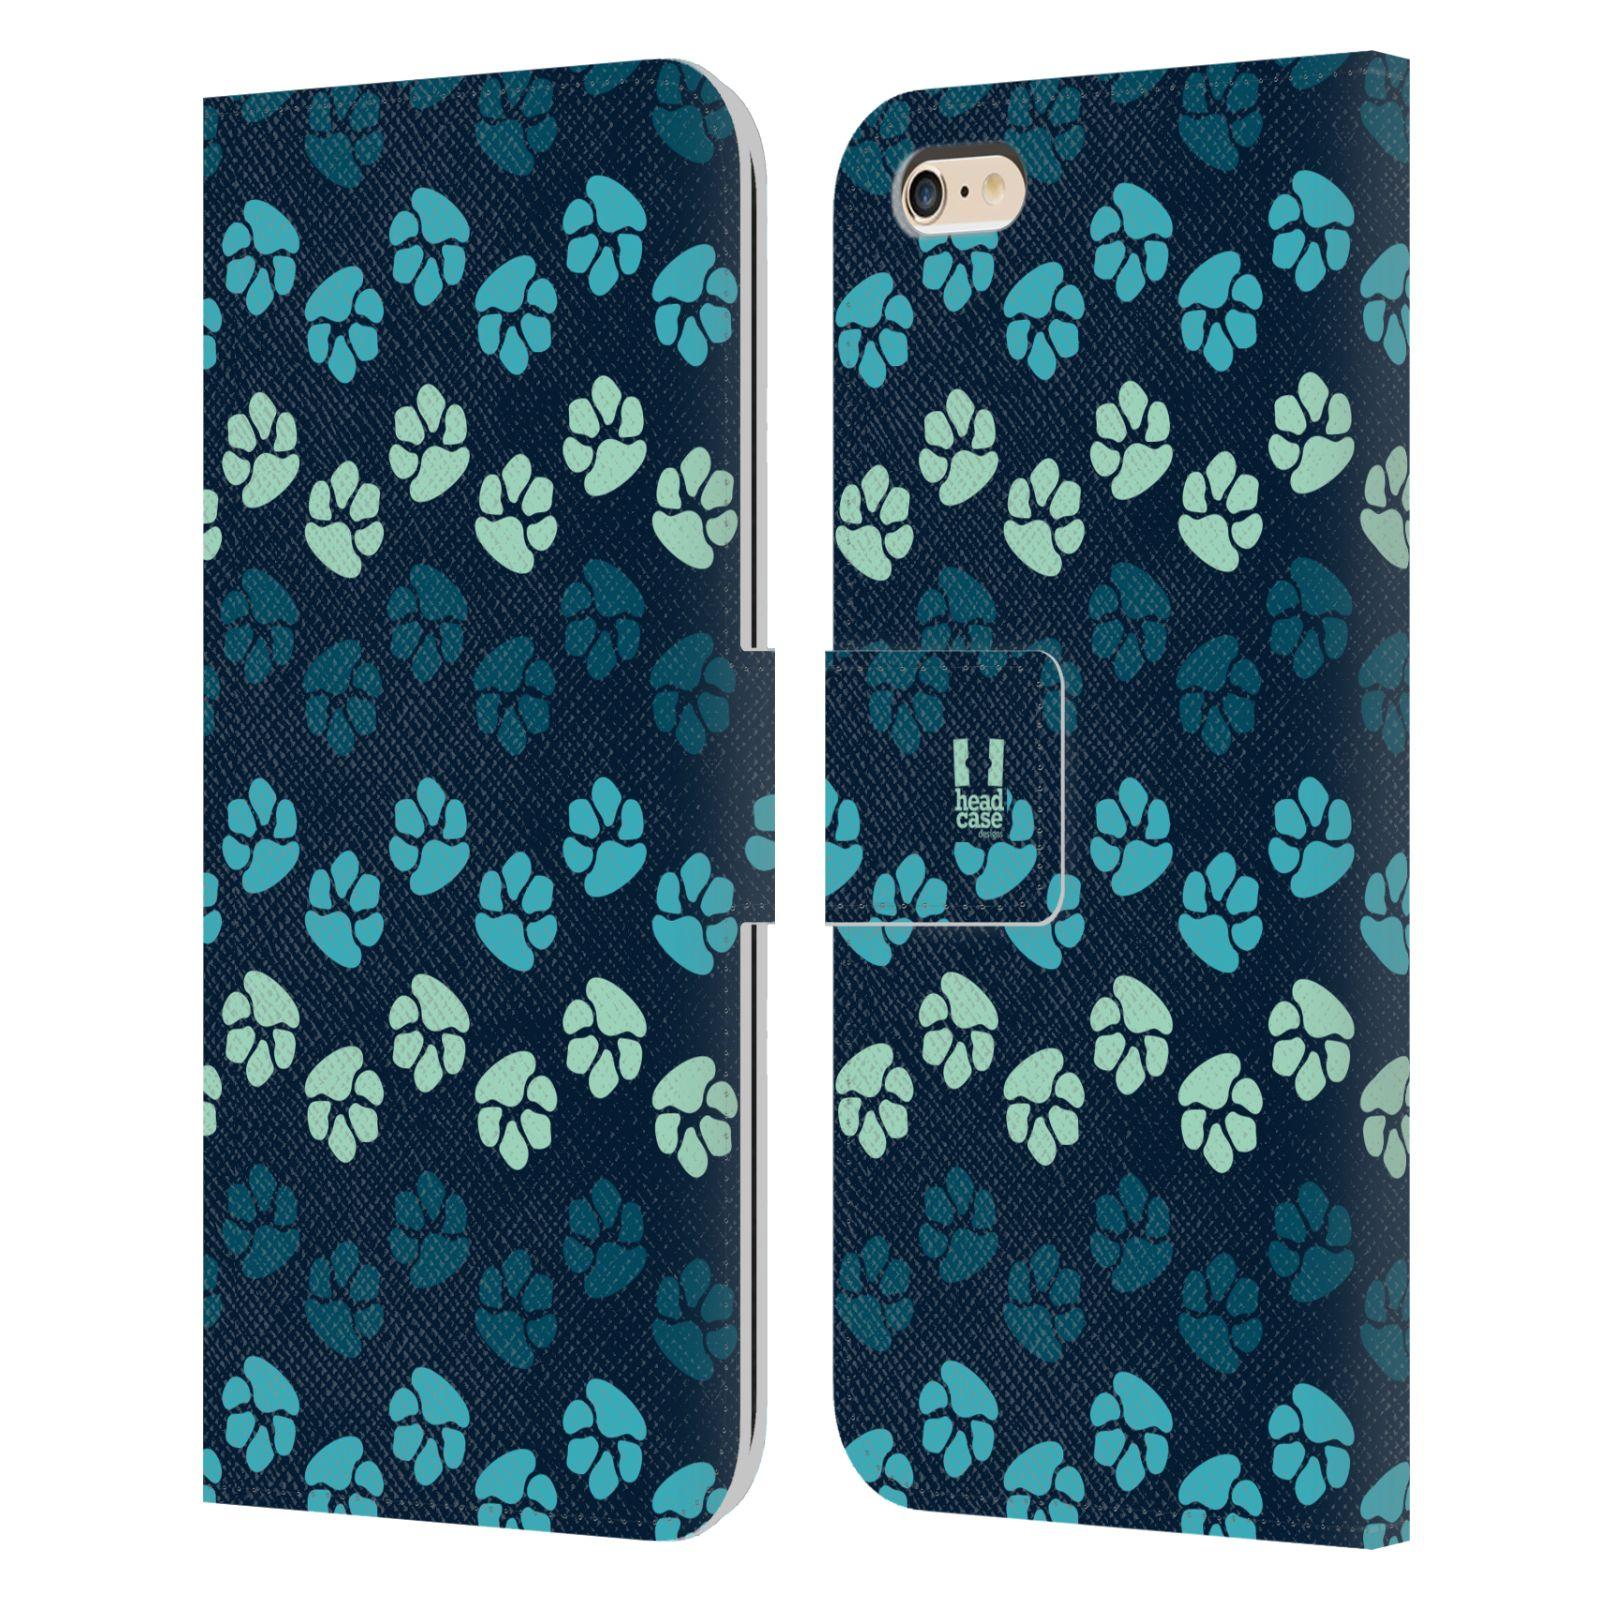 HEAD CASE Flipové pouzdro pro mobil Apple Iphone 6 PLUS / 6S PLUS Pejsek ťapky modrá barva